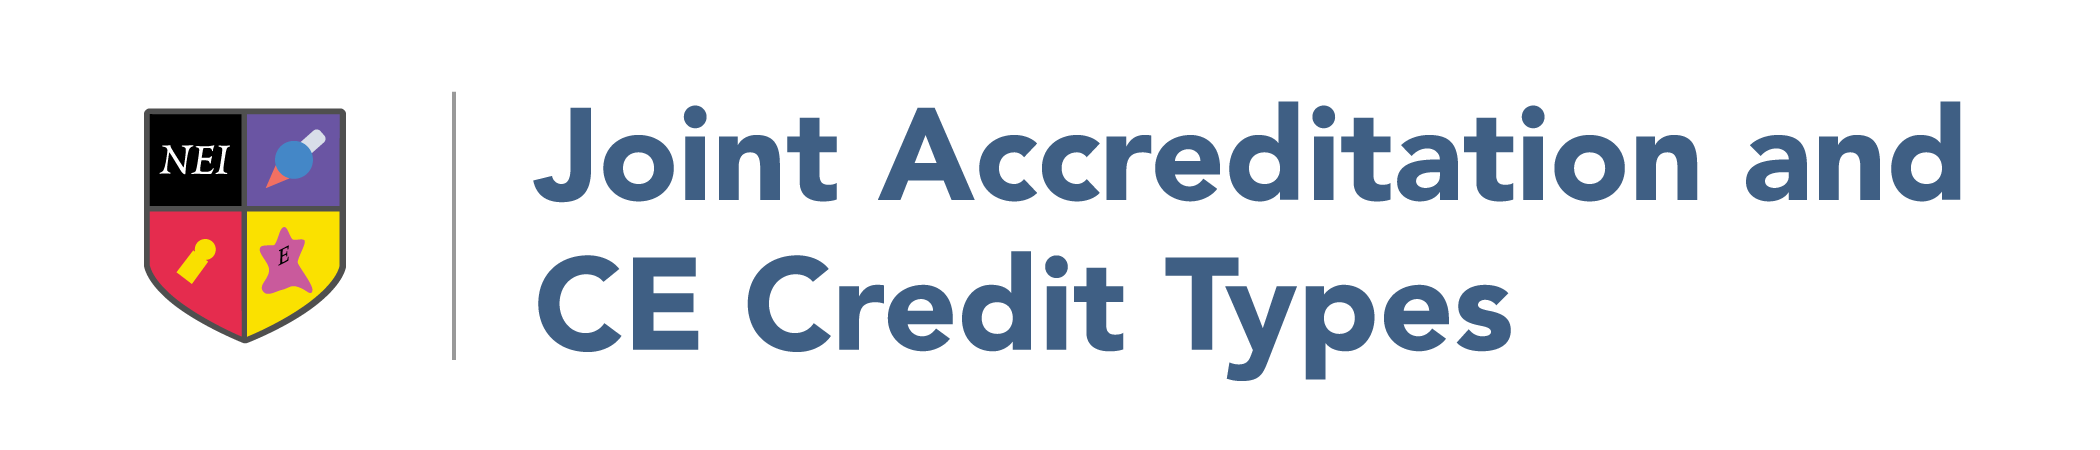 credits_offered_header